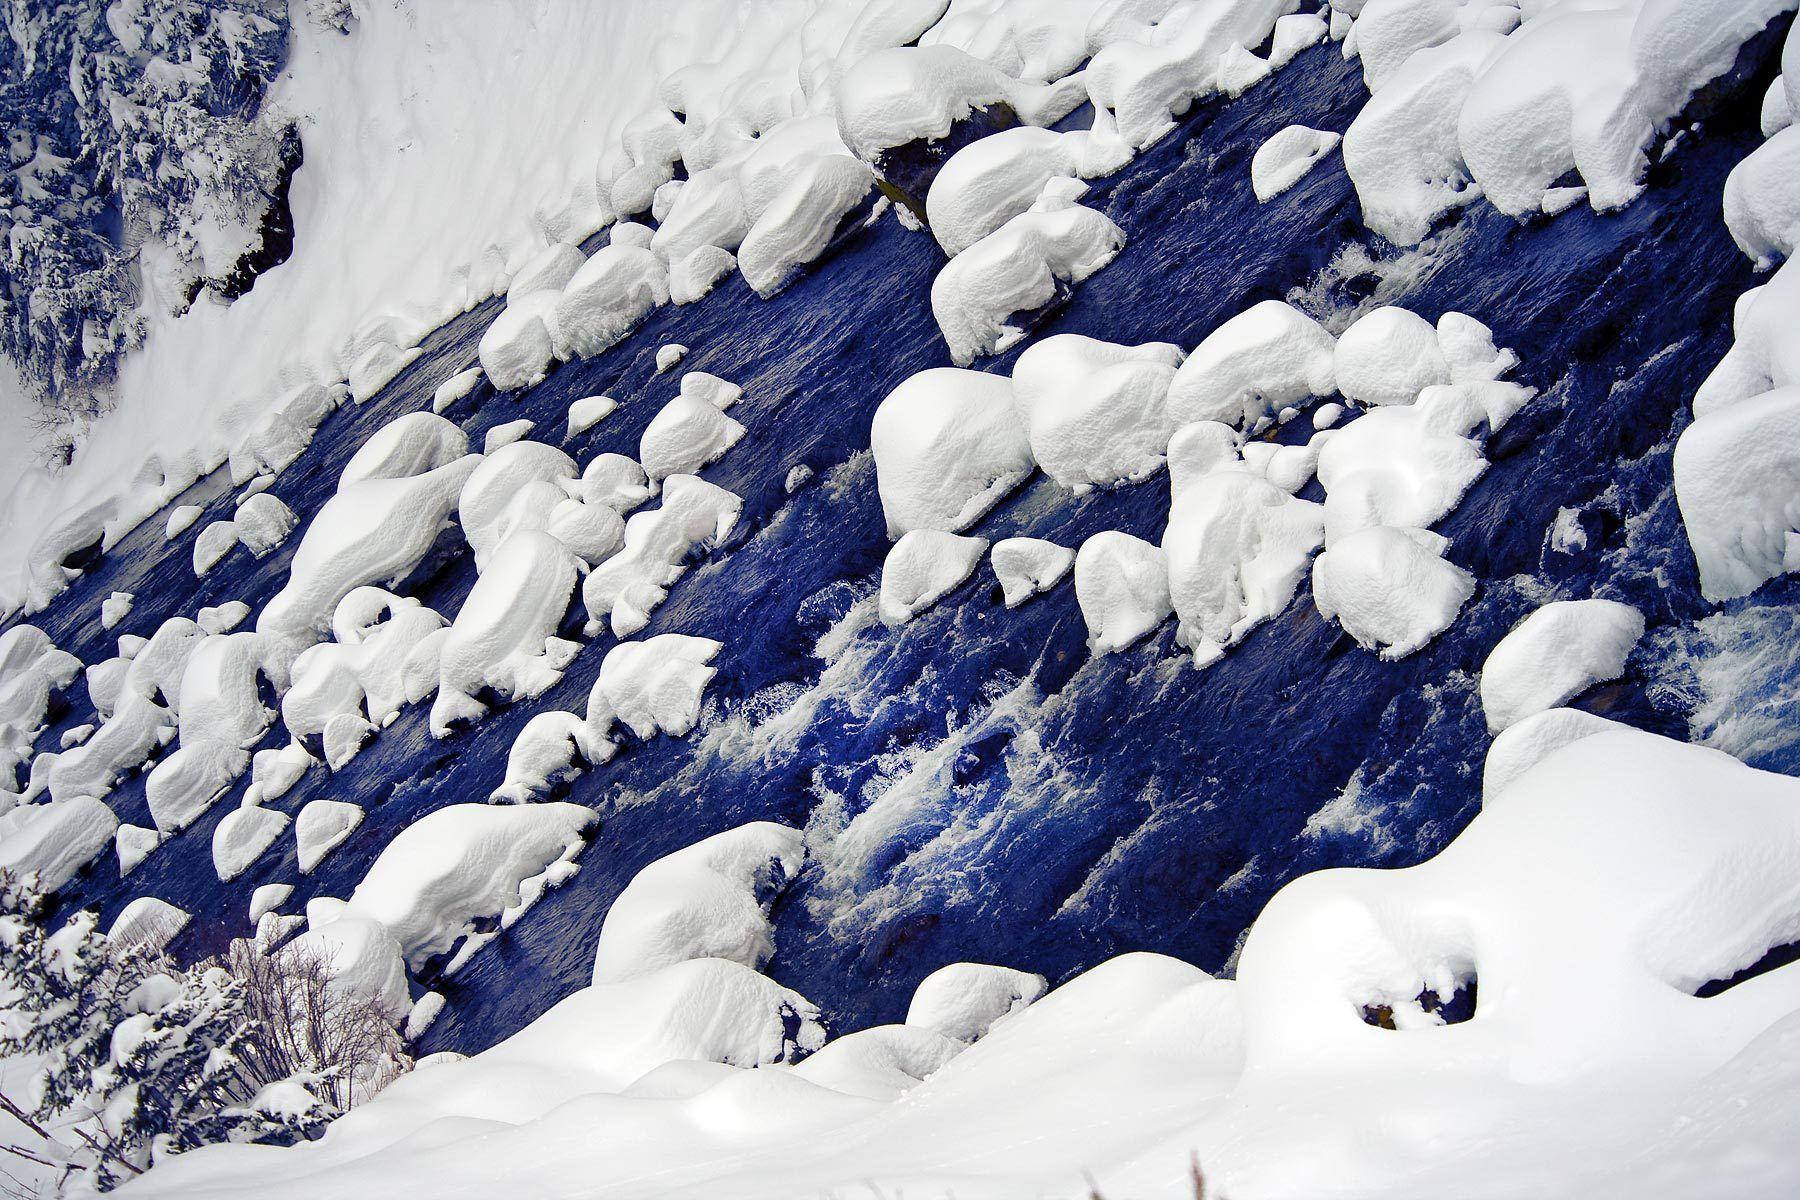 1yellowstone_freezing_river.jpg